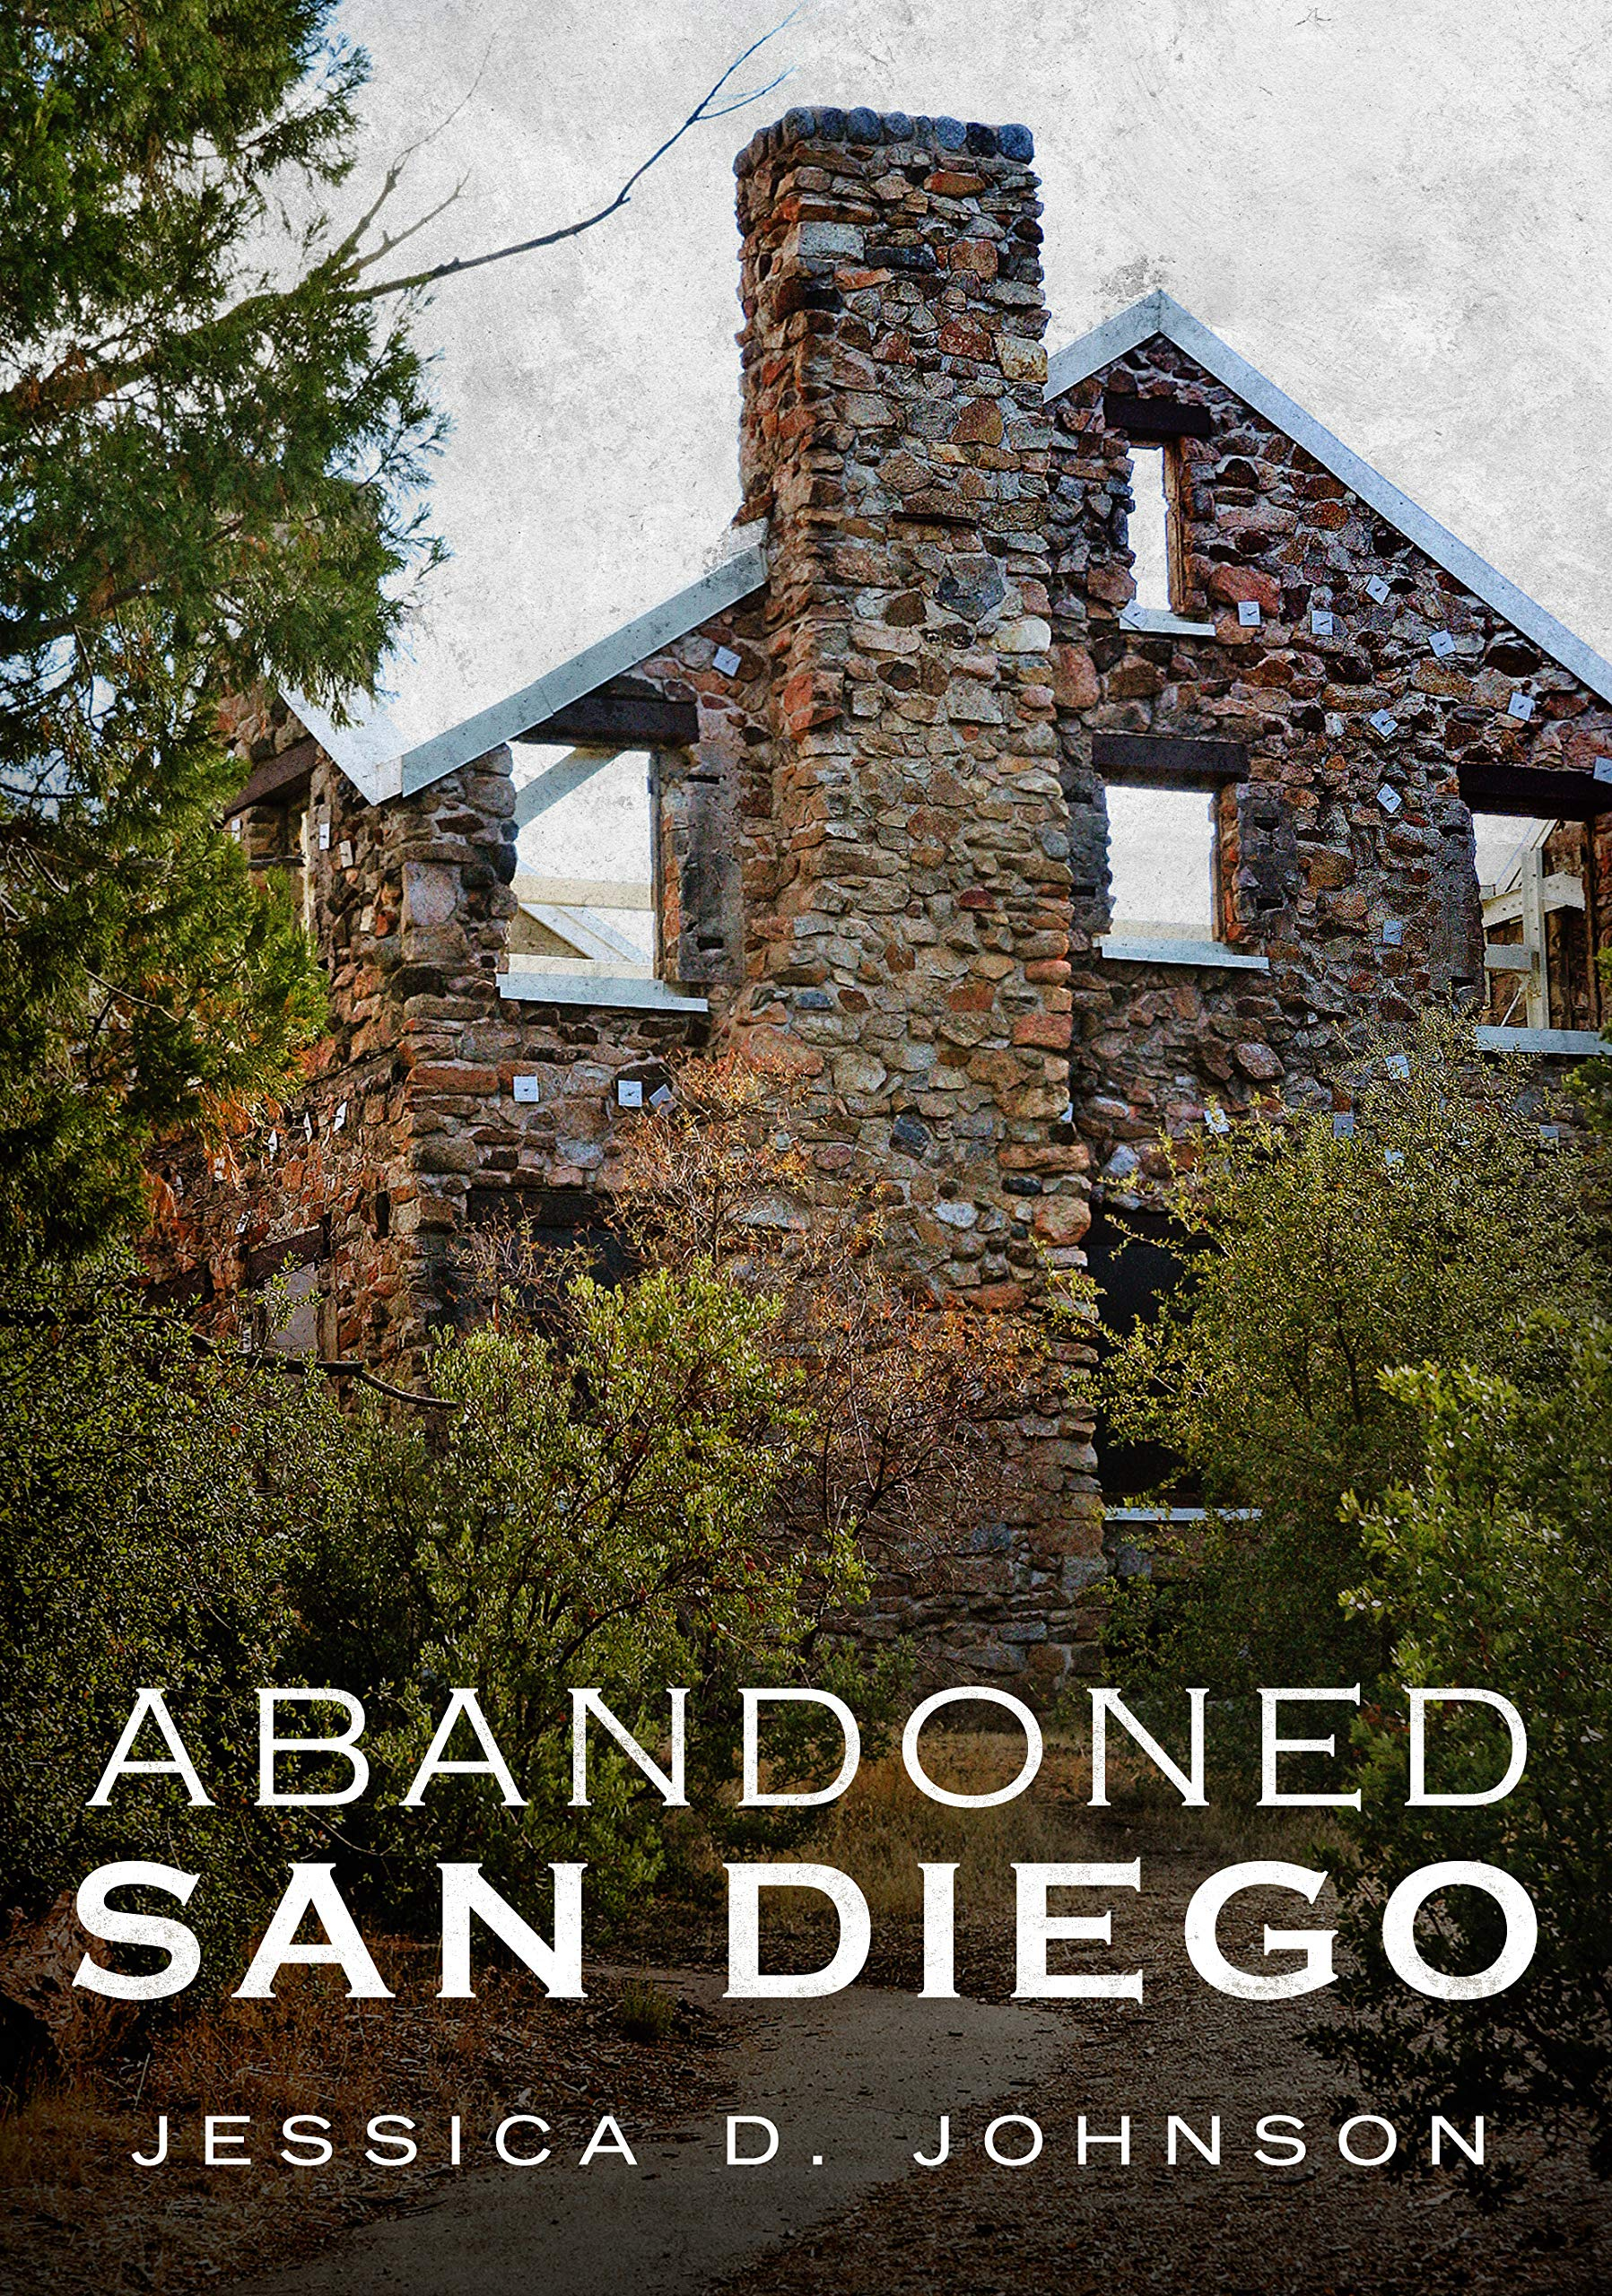 Abandoned San Diego Johnson Jessica D 9781634991049 Amazon Com Books,Modern Long Narrow Bathroom Ideas